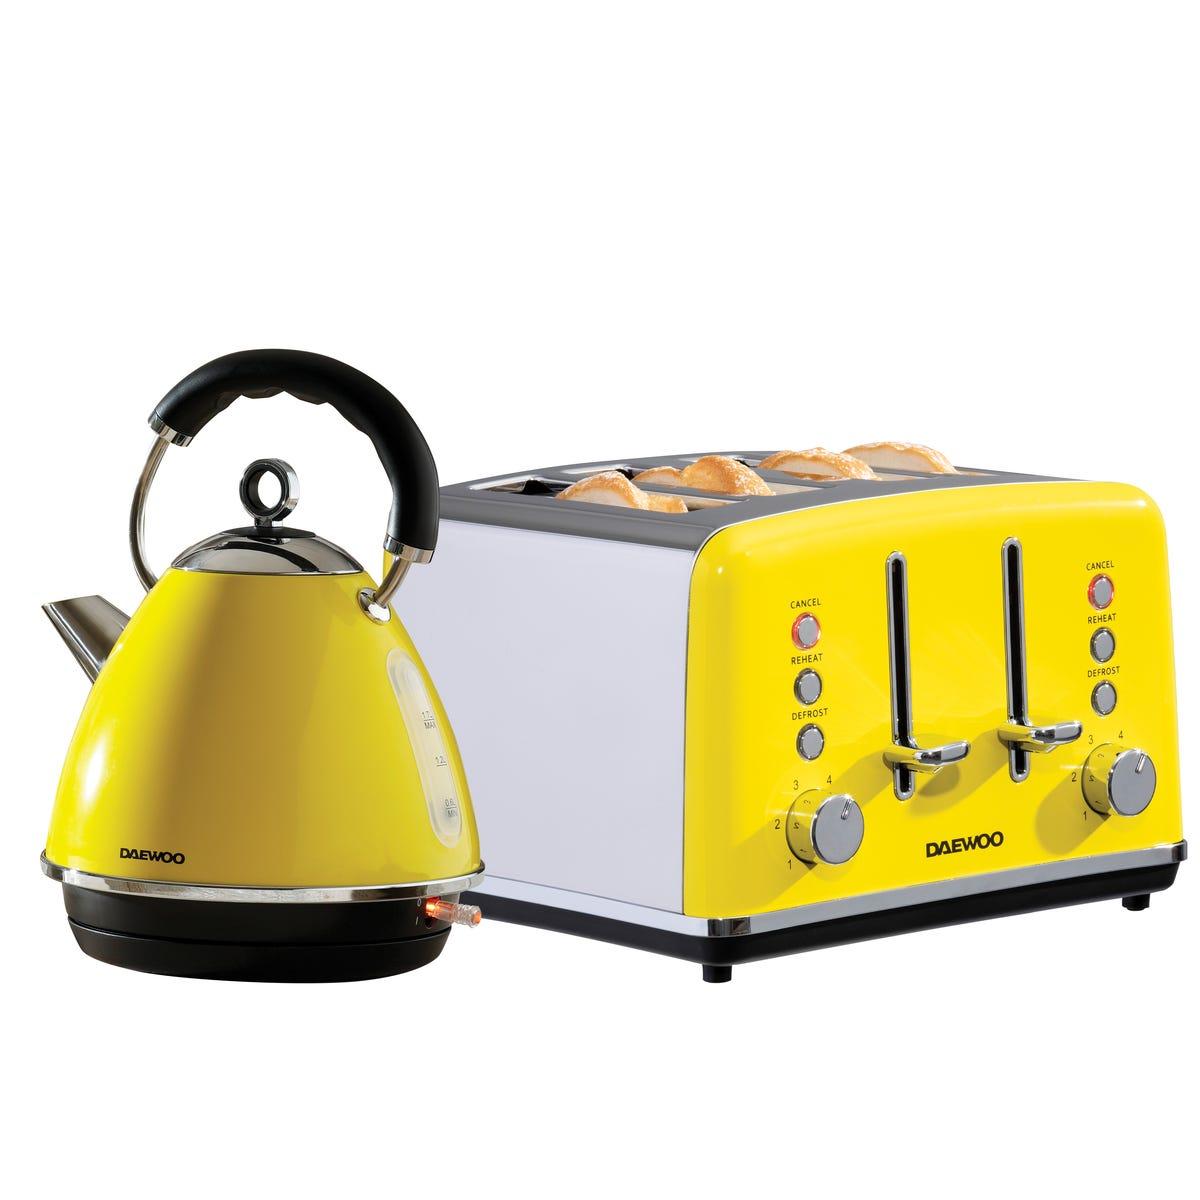 Daewoo SDA2374DS Soho 1.7L 3KW Pyramid Kettle and 4 Slice Toaster Set - Yellow